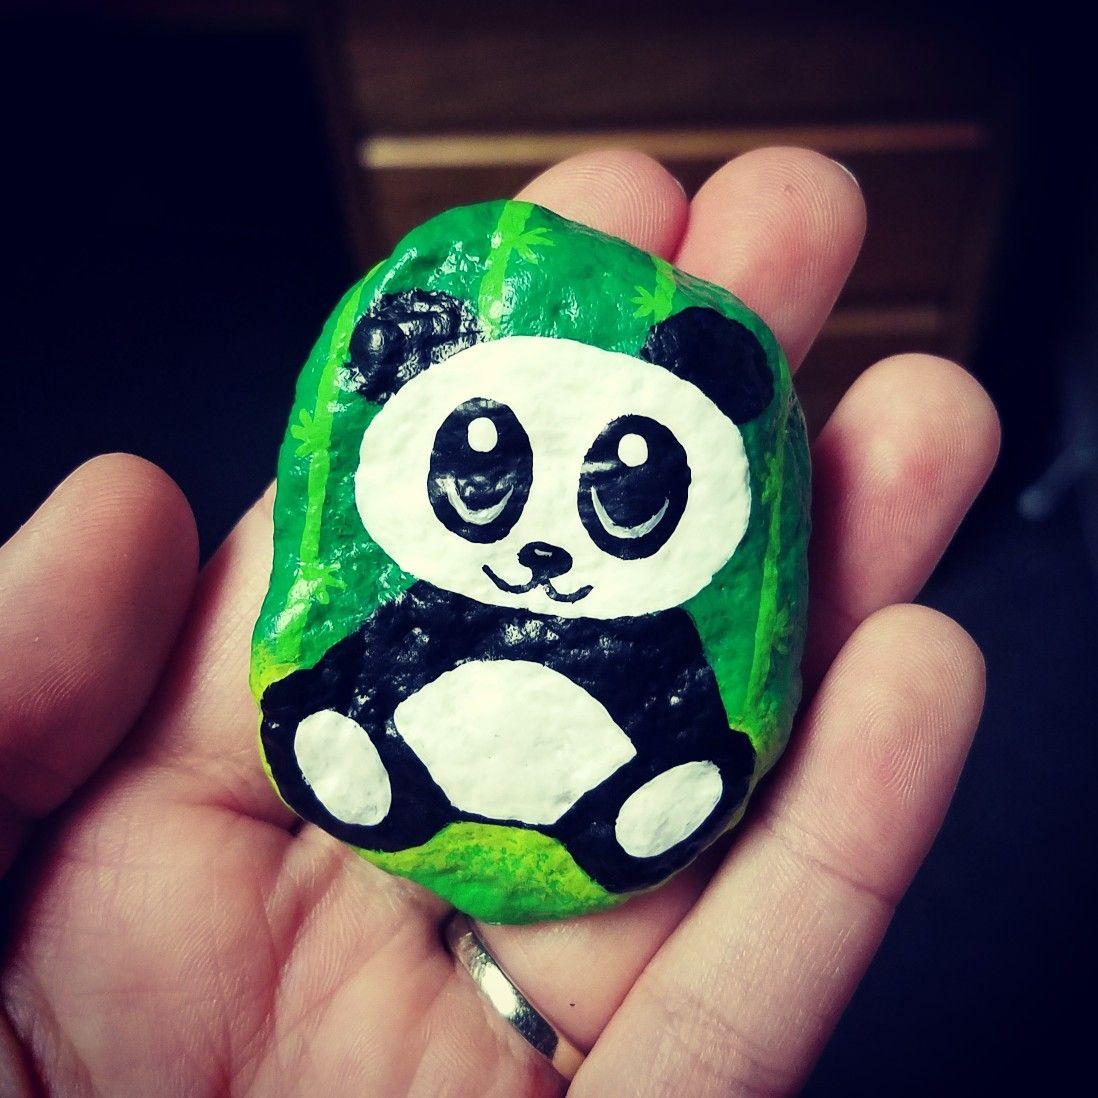 Painted rock / rock painting / rock art / painted stones / panda / cute